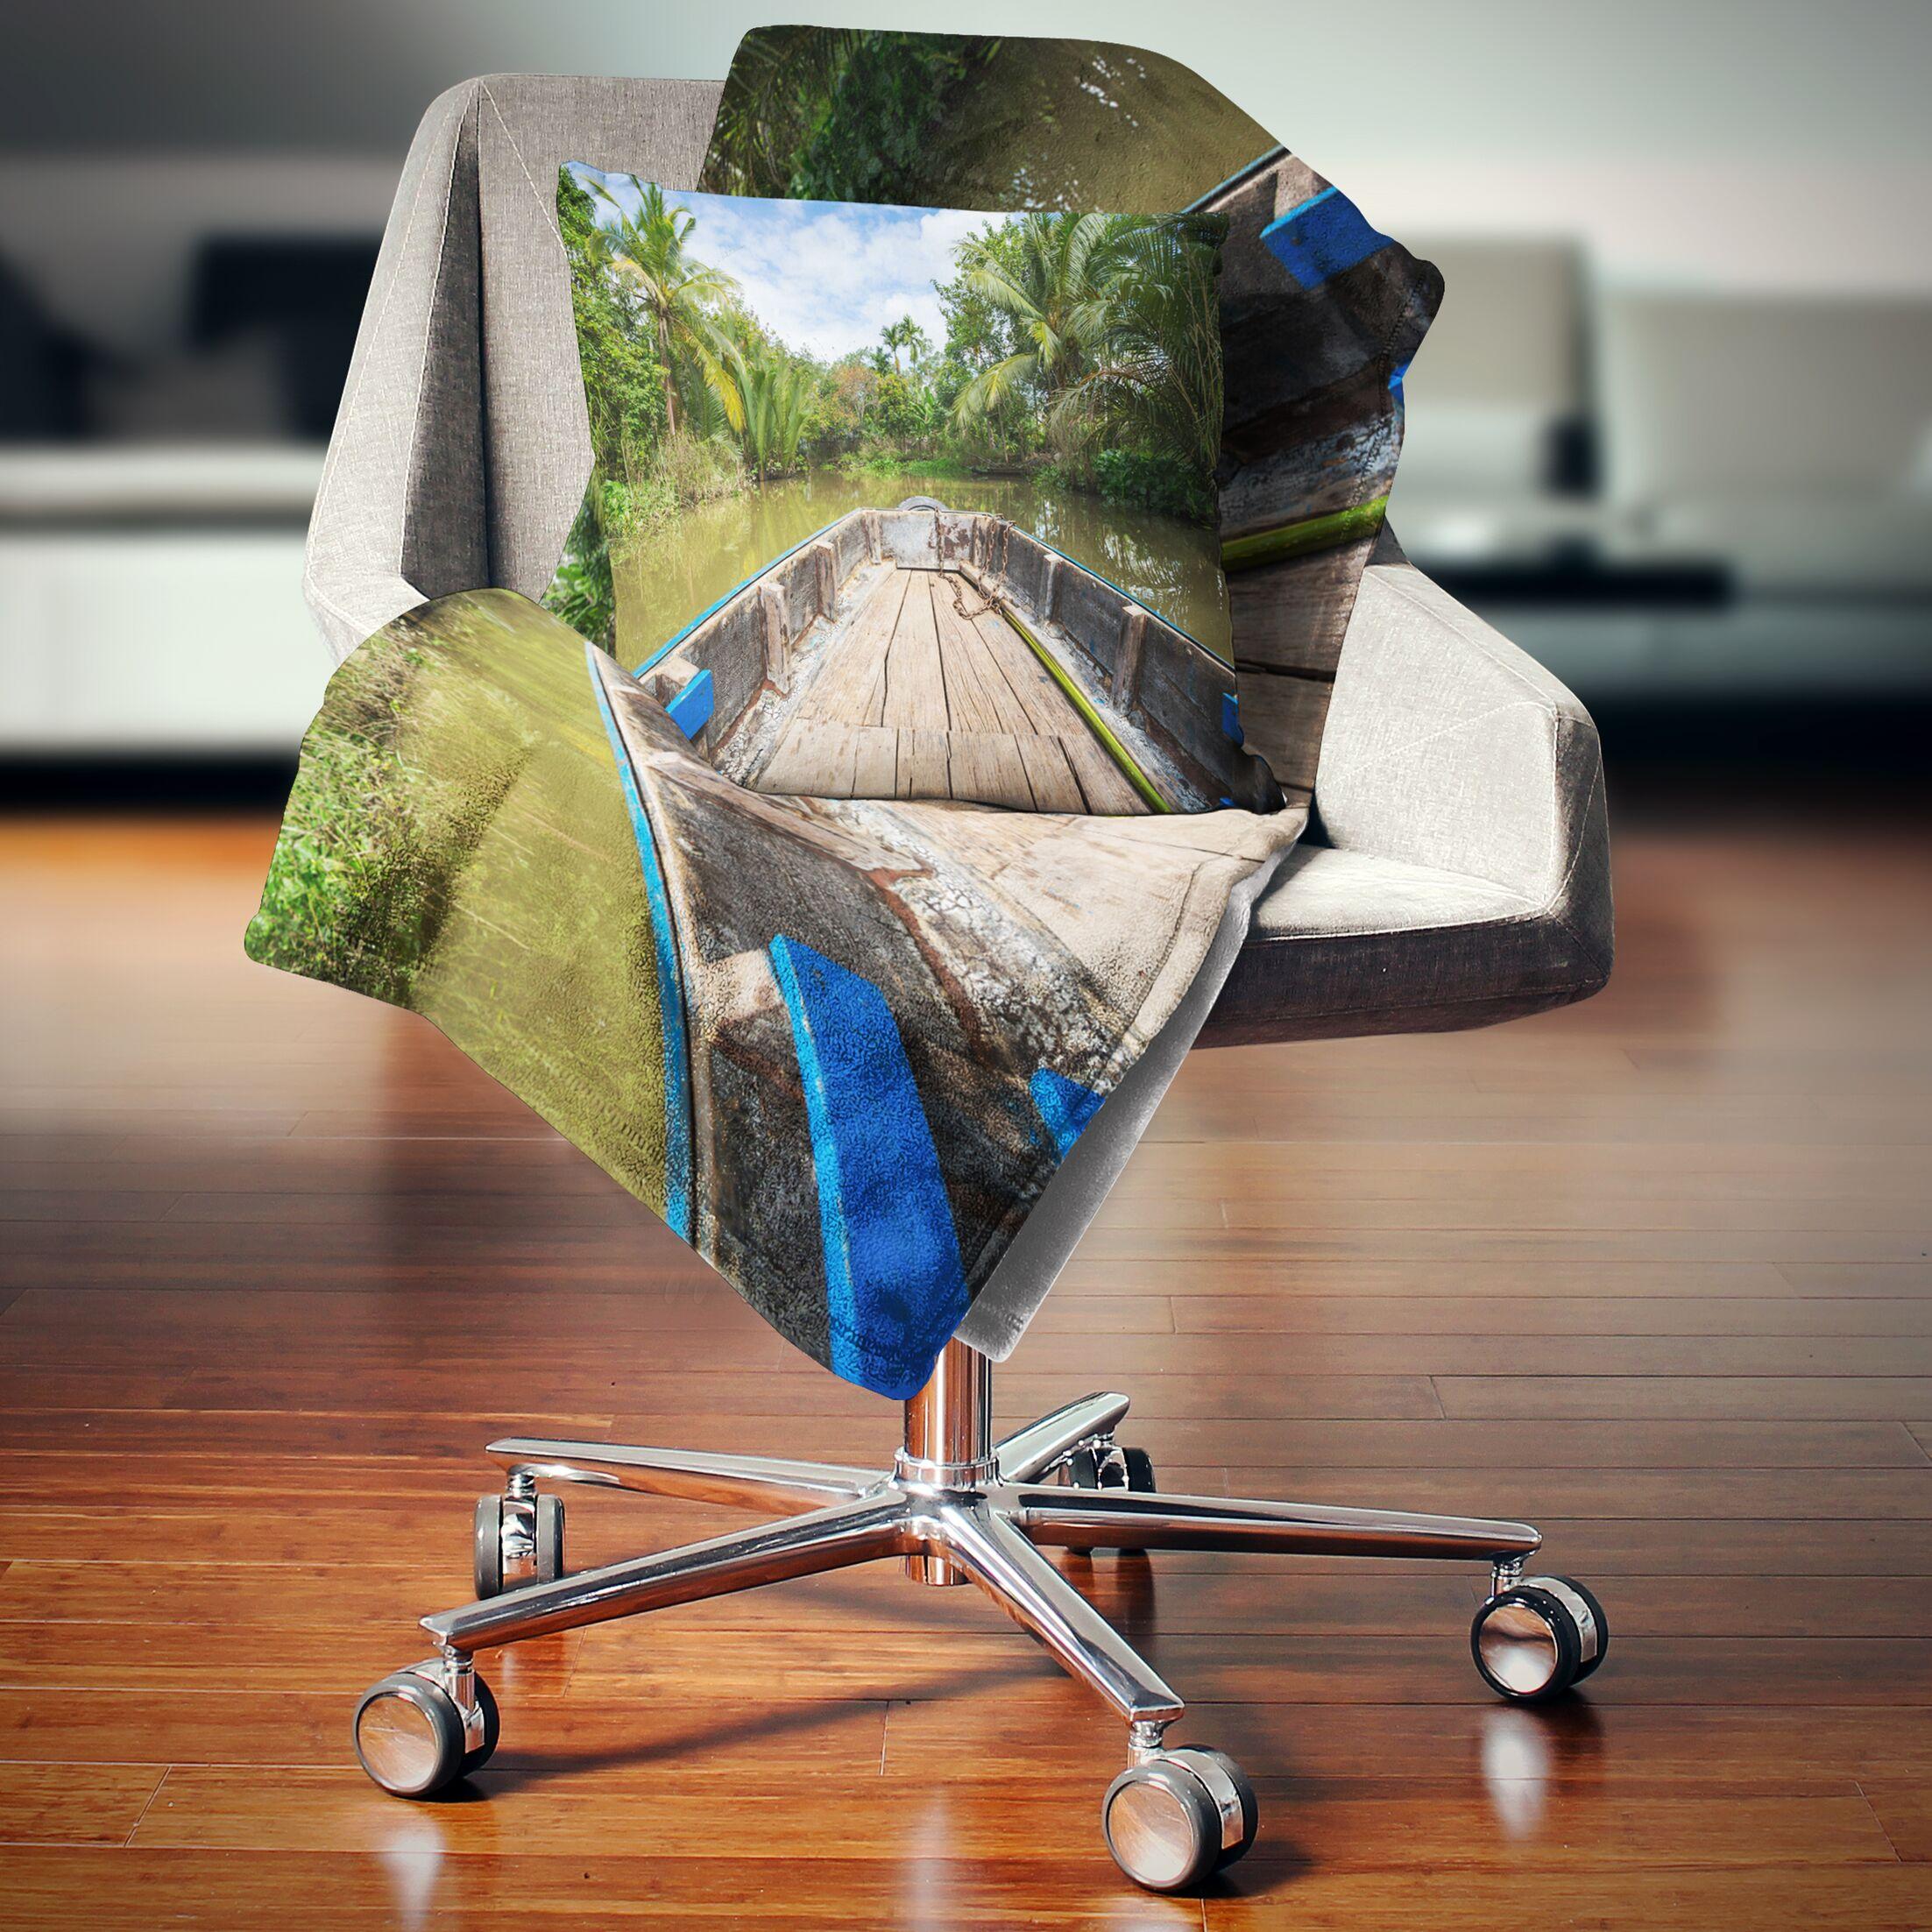 Landscape Boat in Mekong River Vietnam Pillow